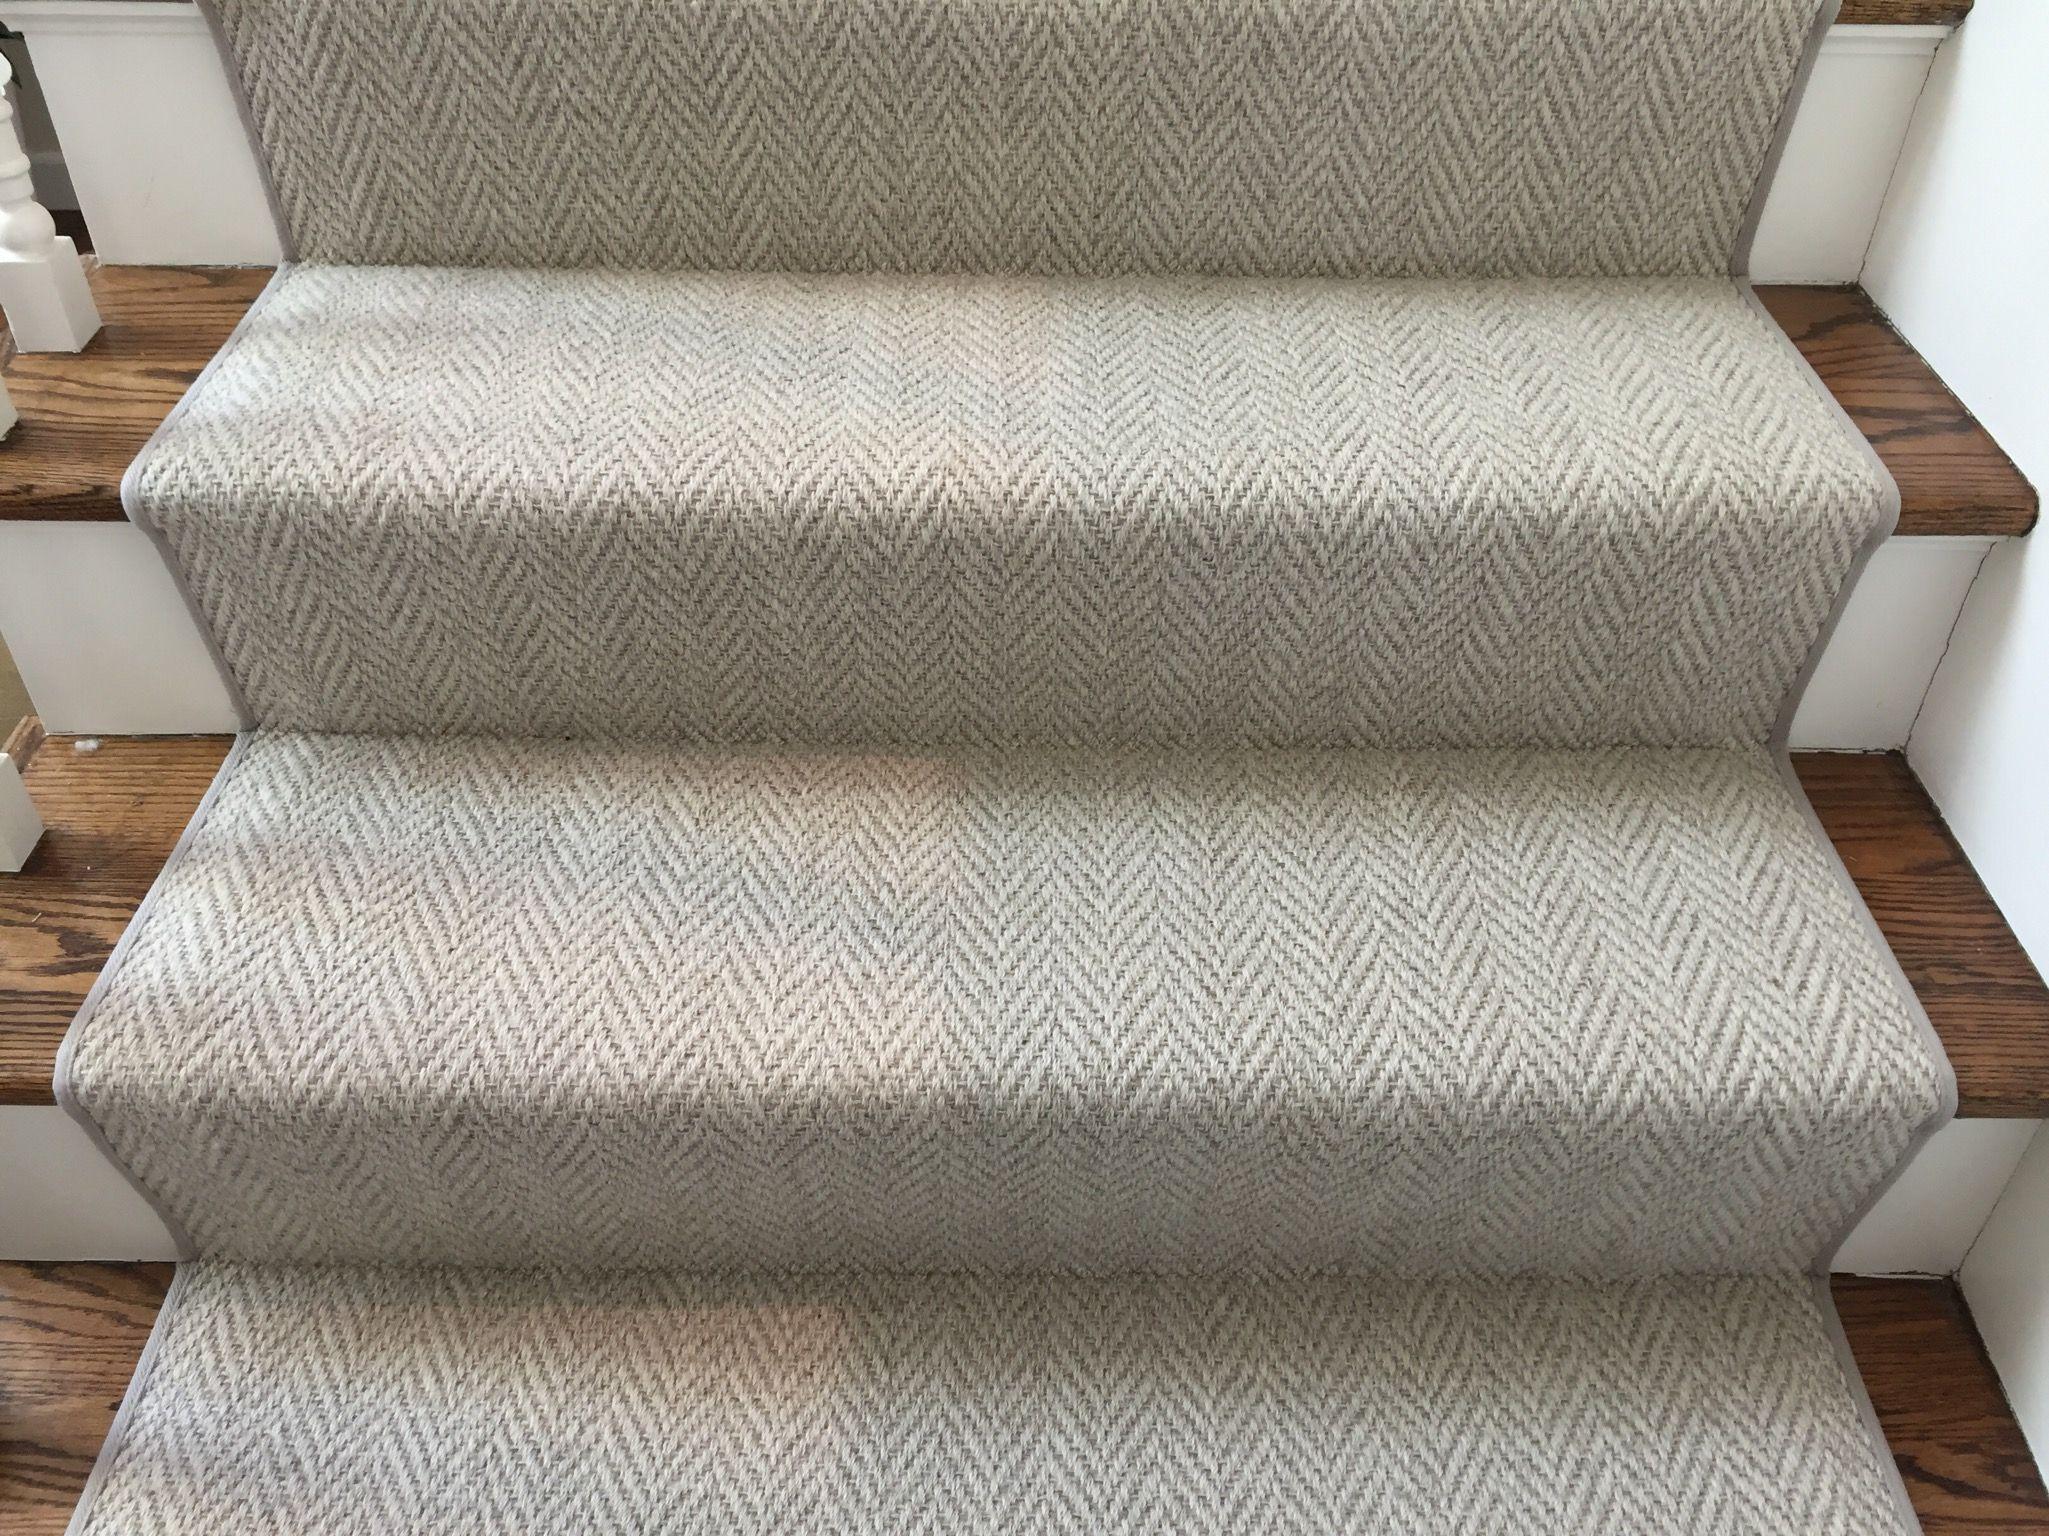 Carpet & Rug Projects | Boston area, Herringbone and ...